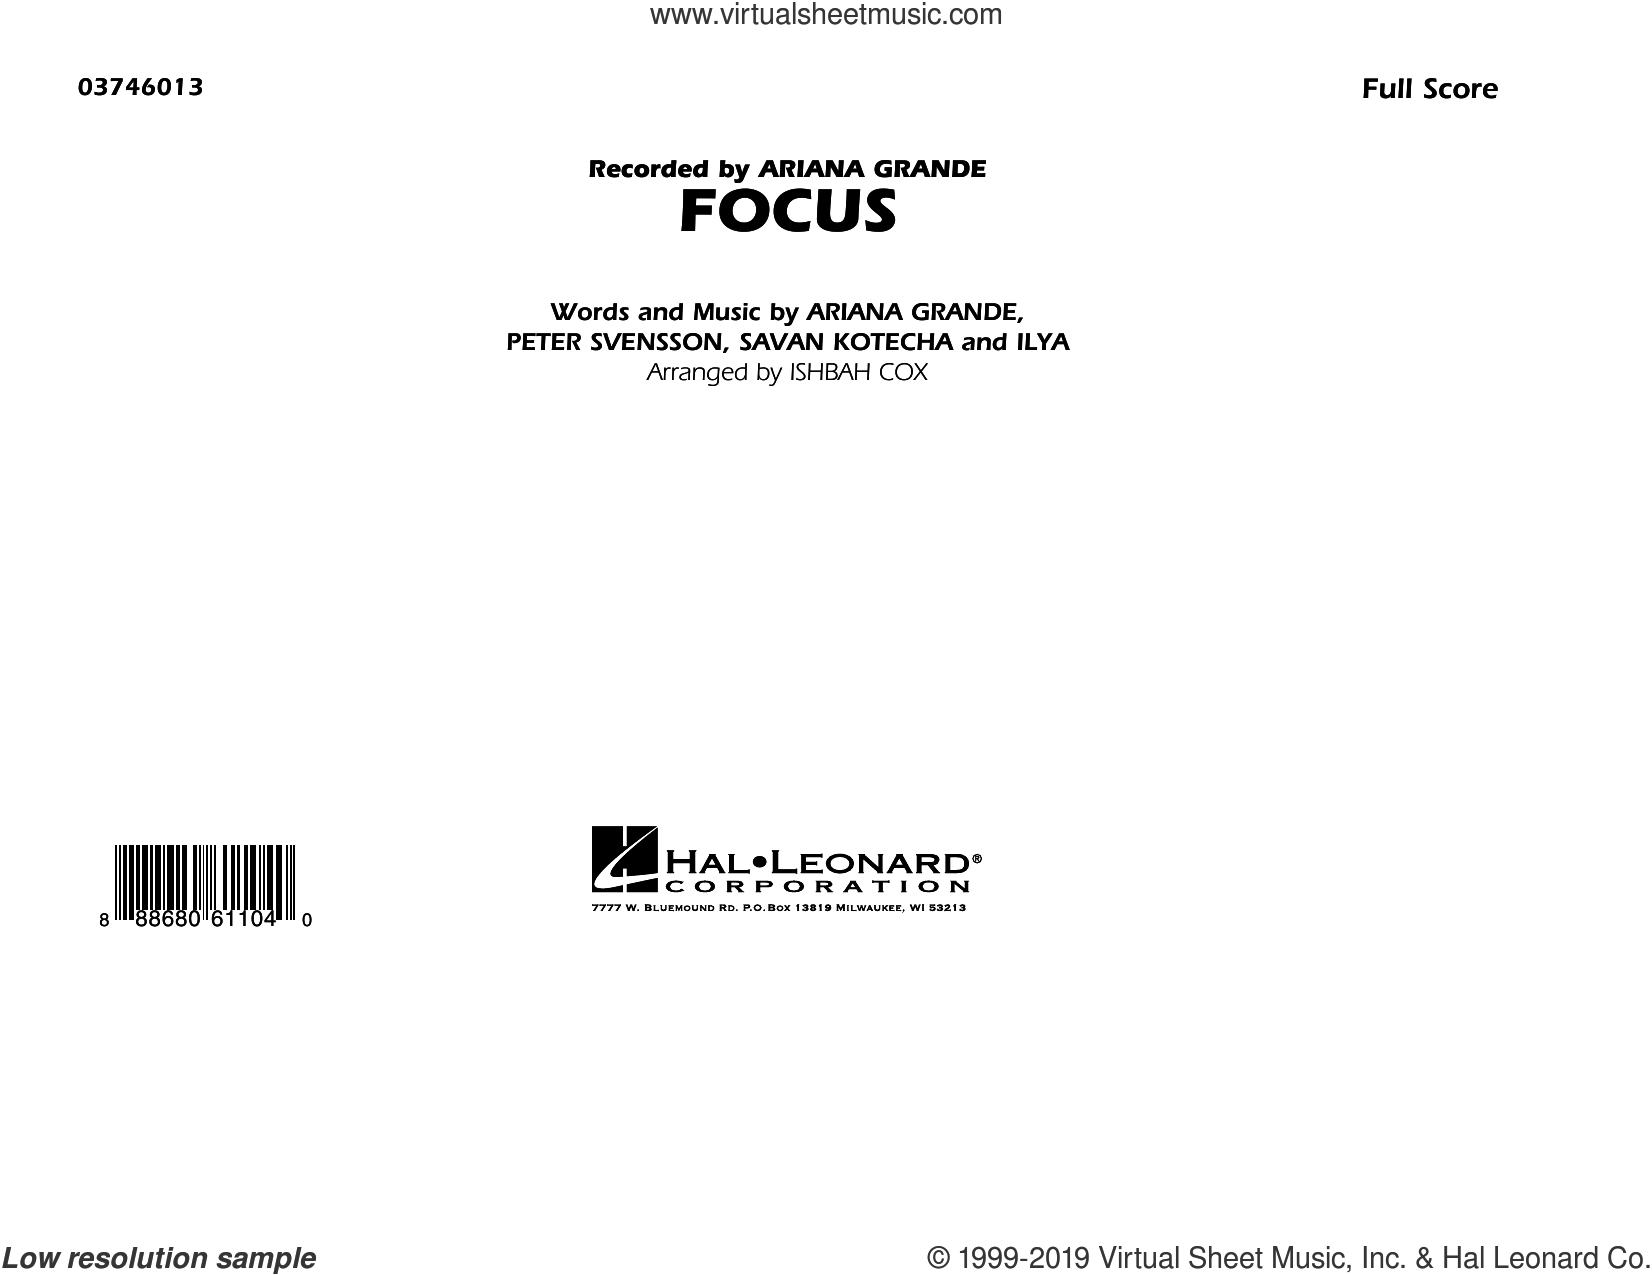 Focus (COMPLETE) sheet music for marching band by Ariana Grande, Ilya, Ishbah Cox, Peter Svensson and Savan Kotecha, intermediate skill level